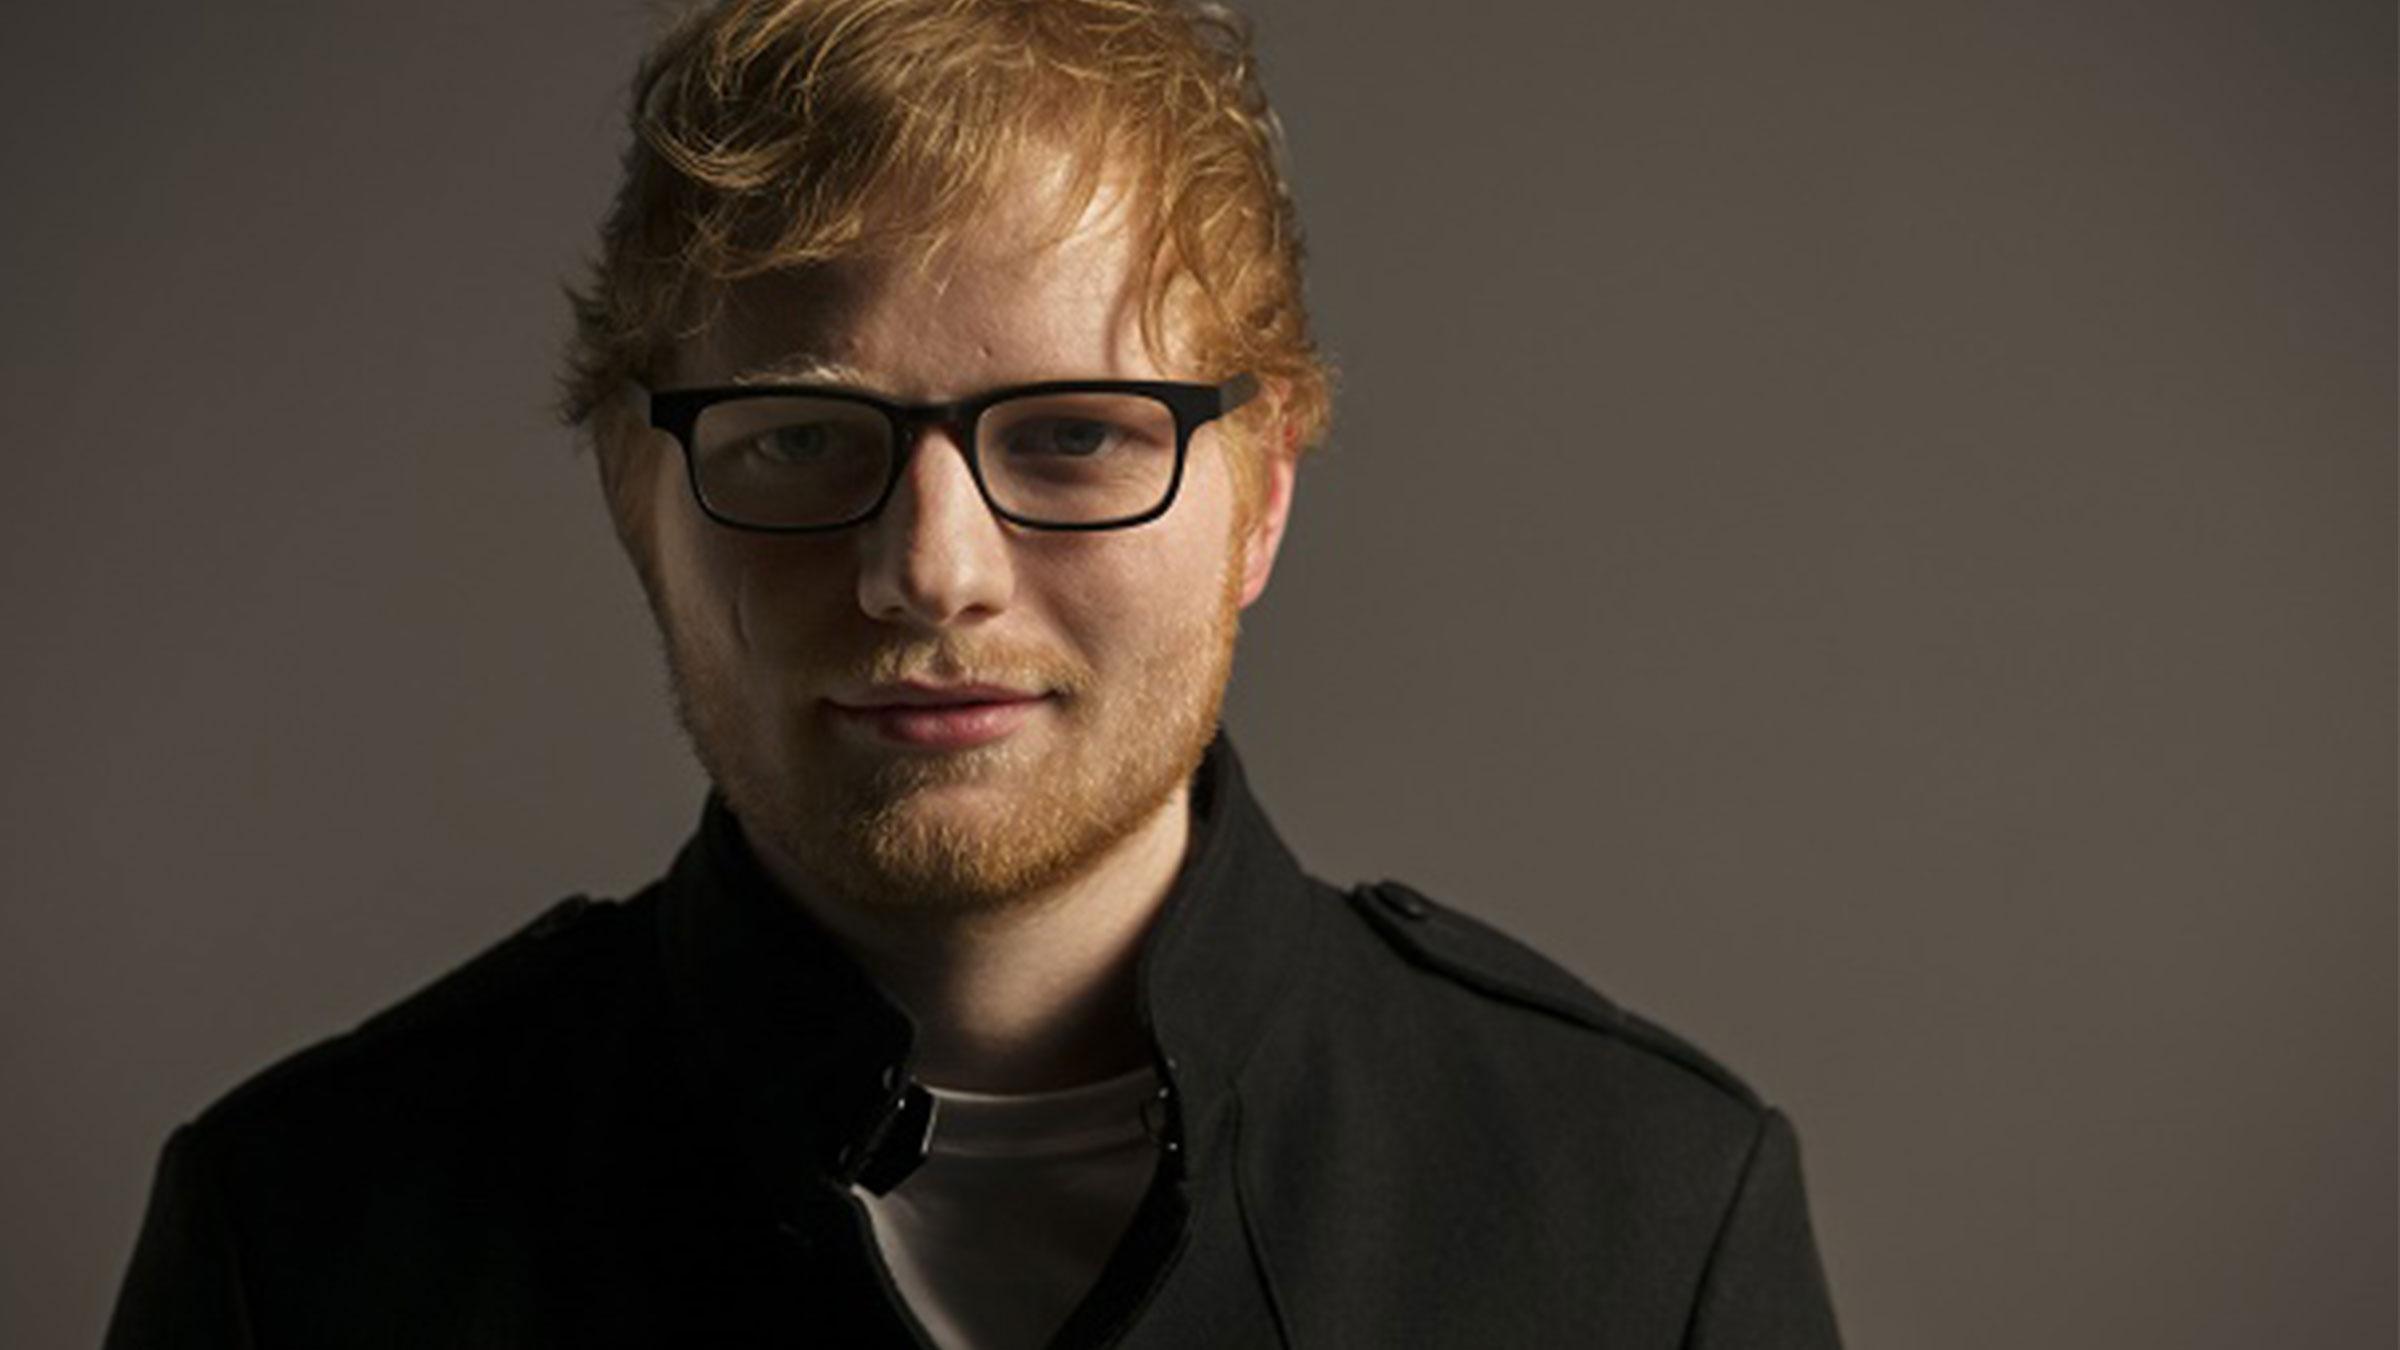 Ed sheeran boyband home1